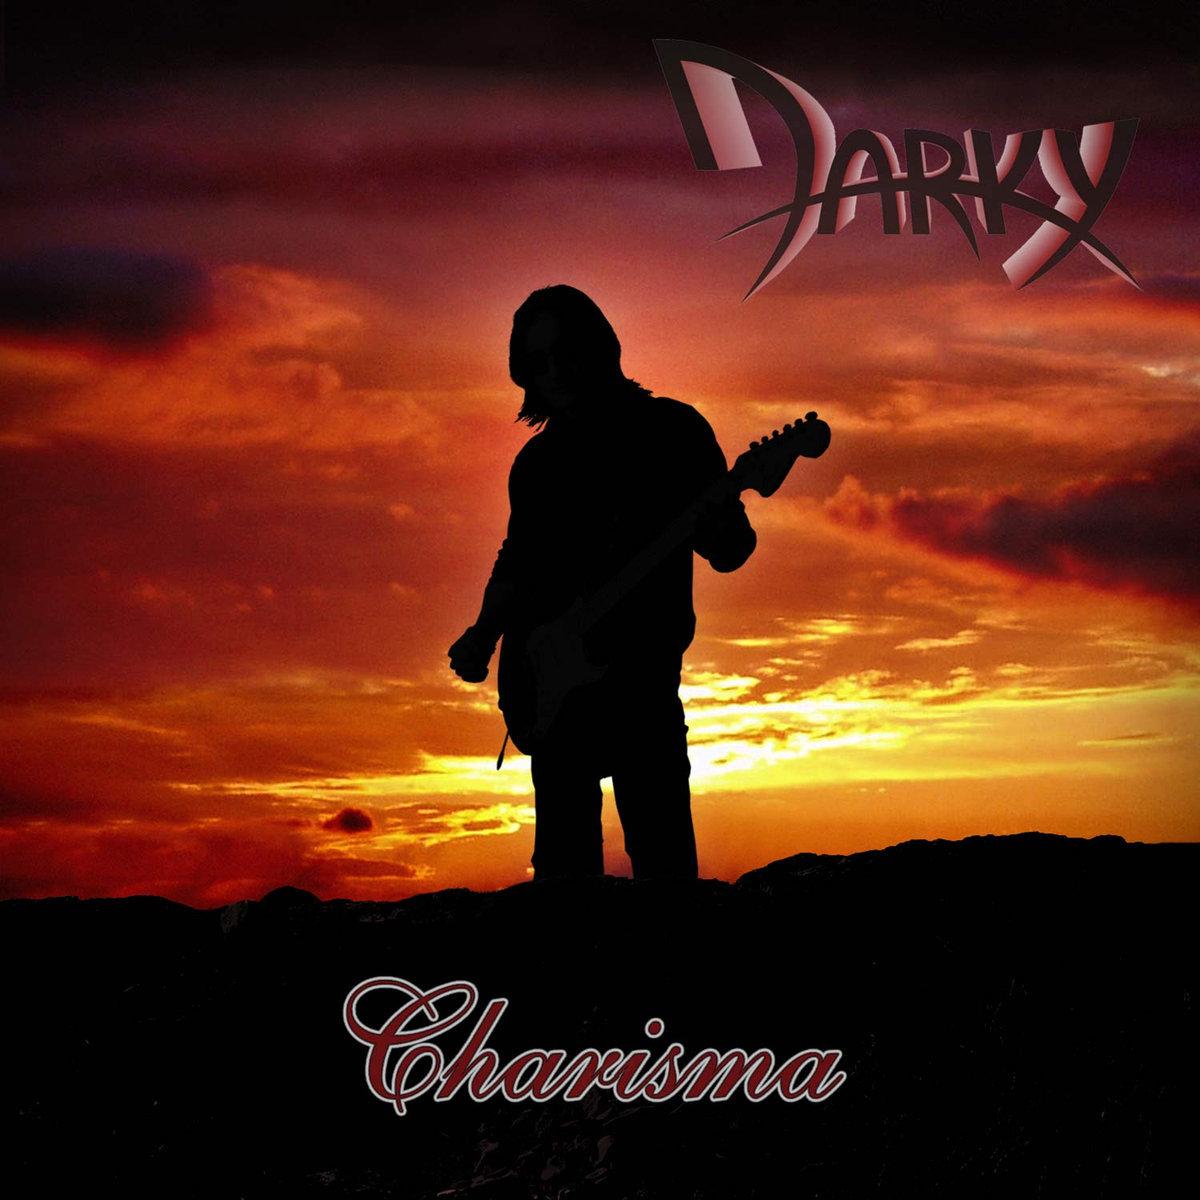 DARKY: Charisma